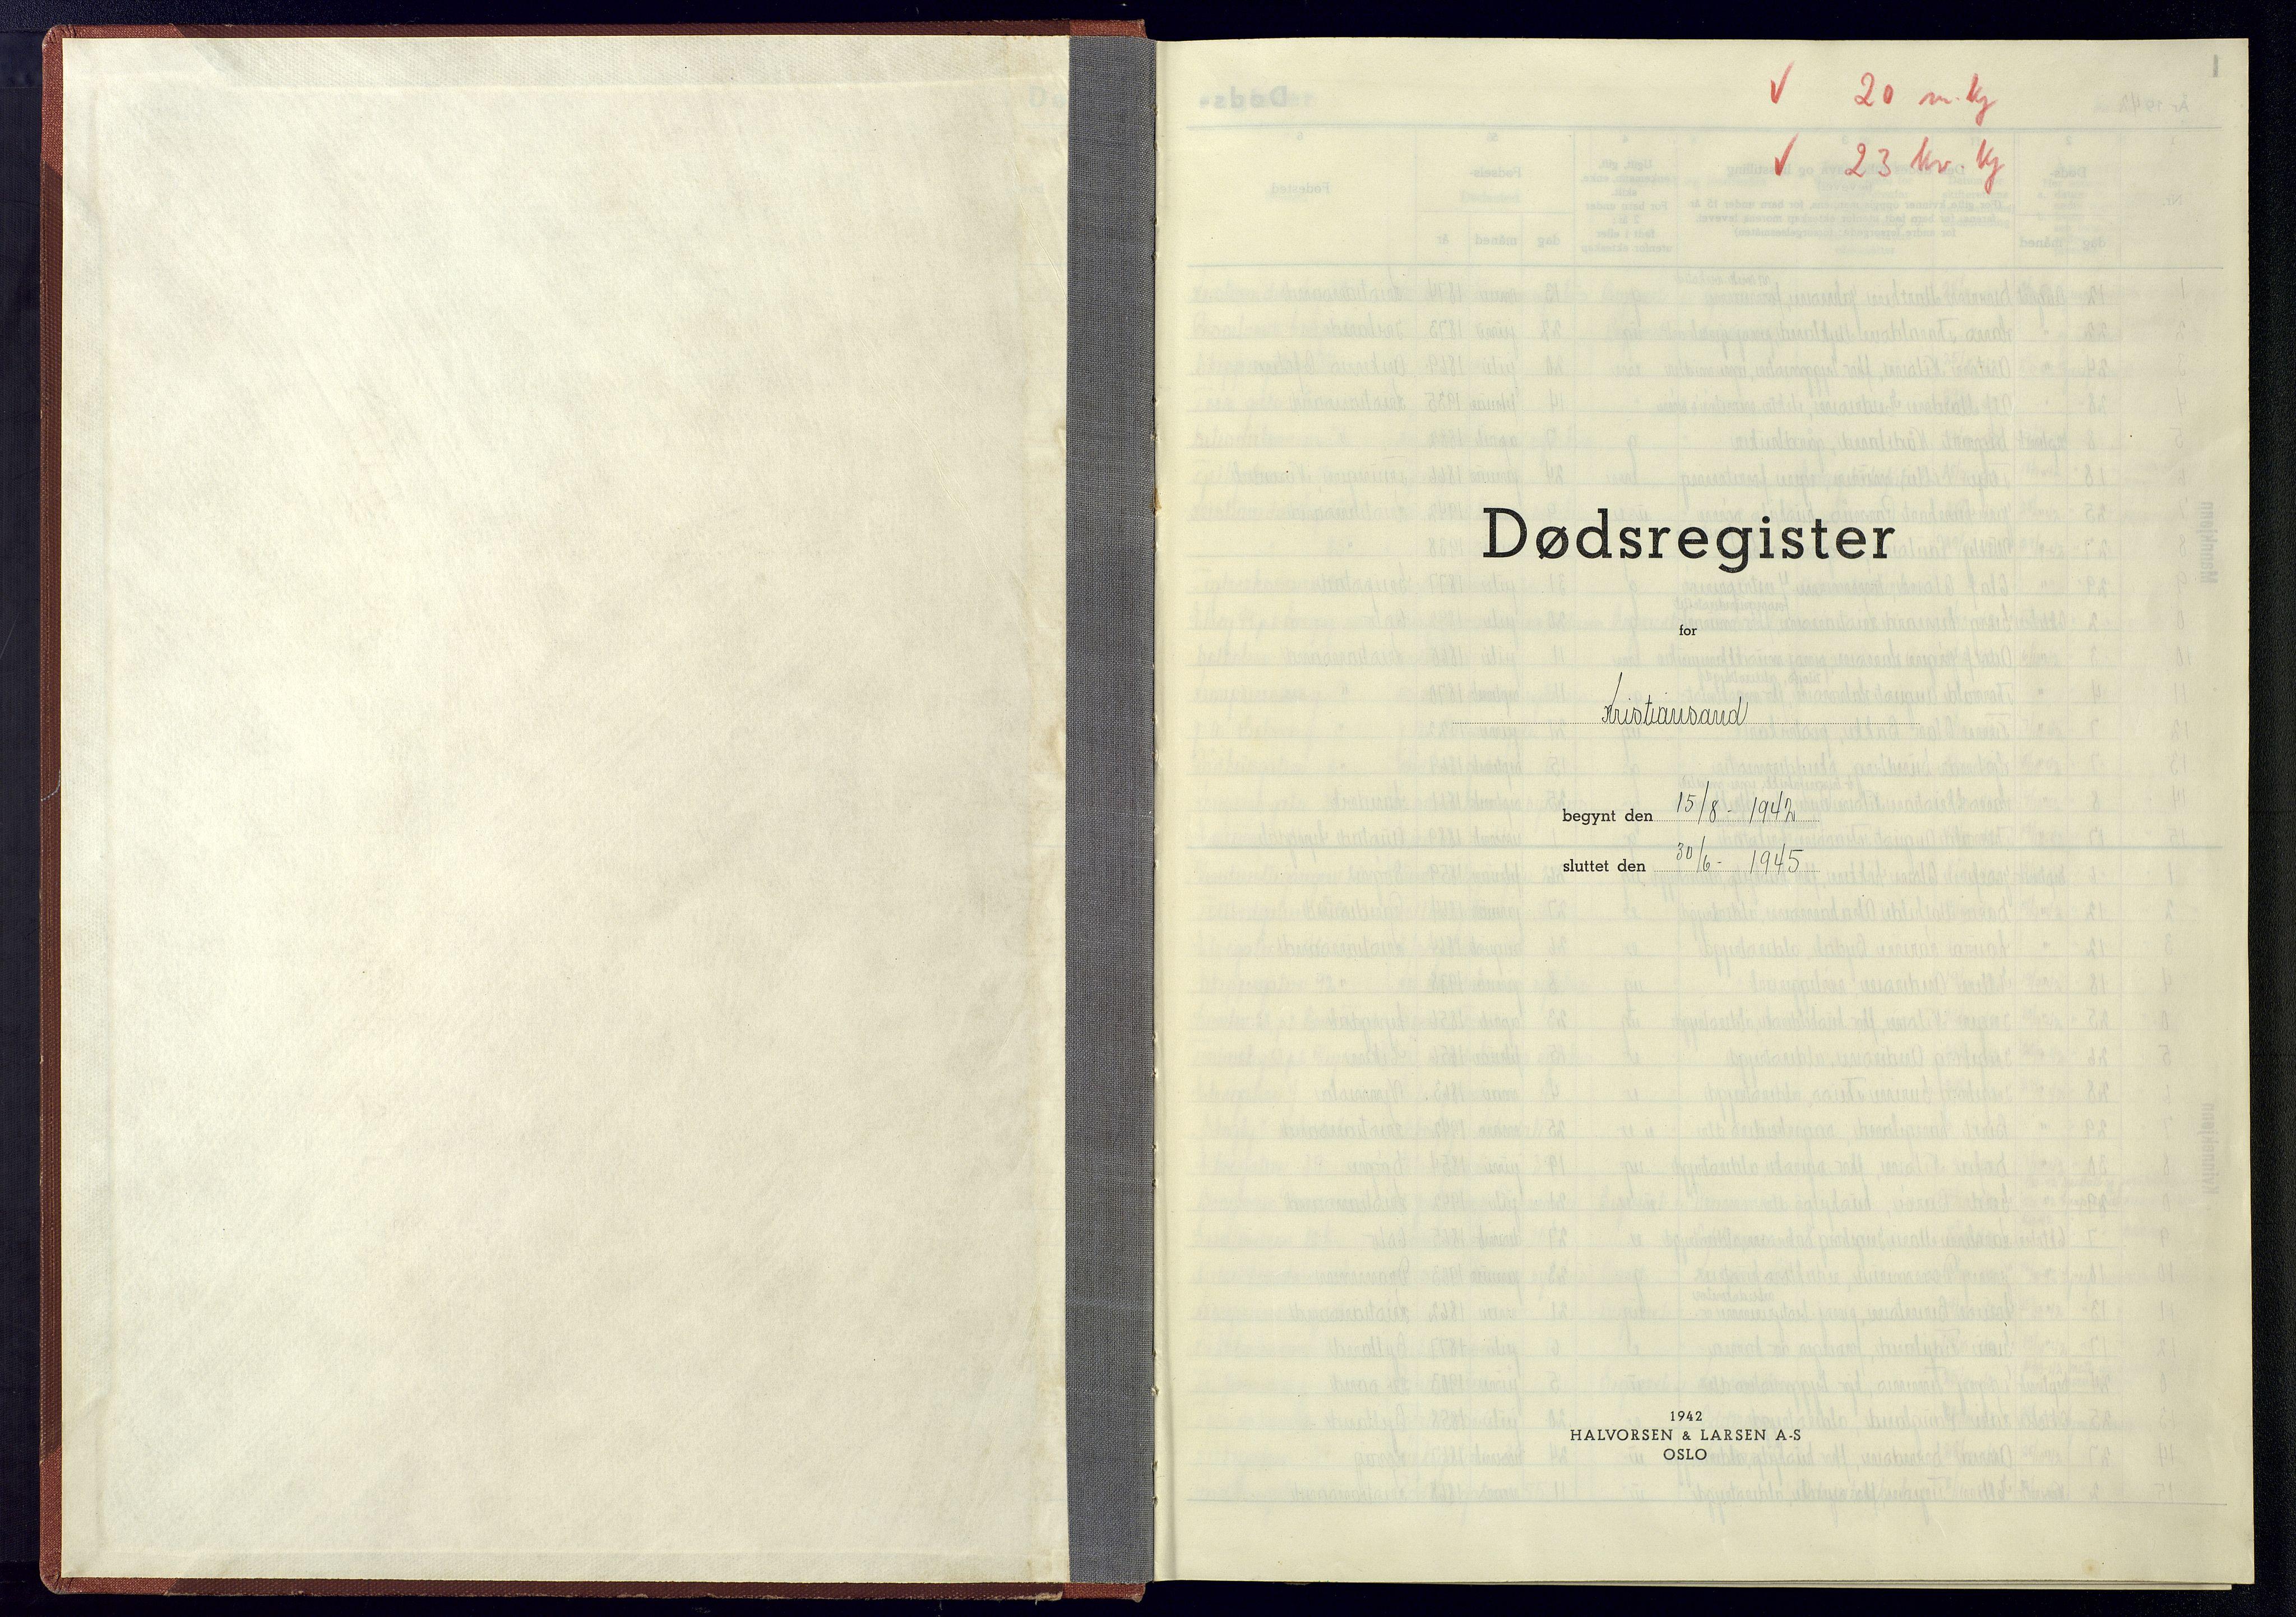 SAK, Kristiansand domprosti, J/Ja/L0004: Dødsfallsregister A-VI-16, 1942-1945